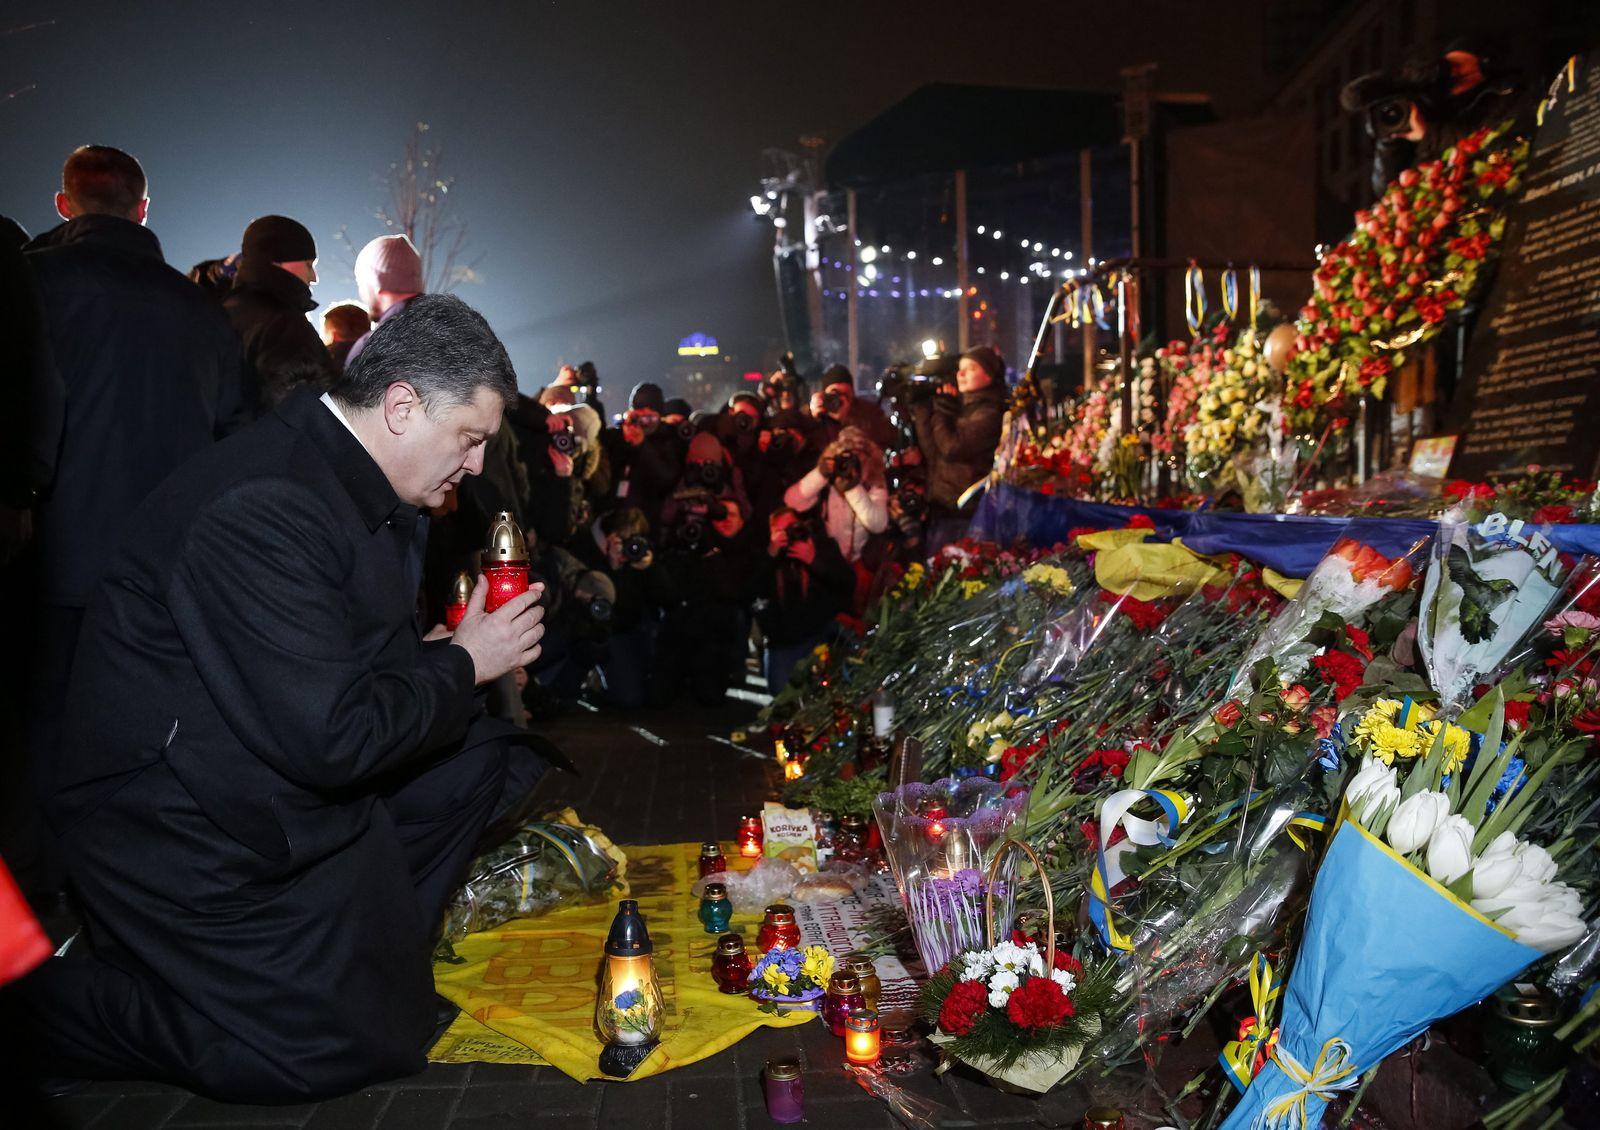 Poroschenko / Kiew / Maidan